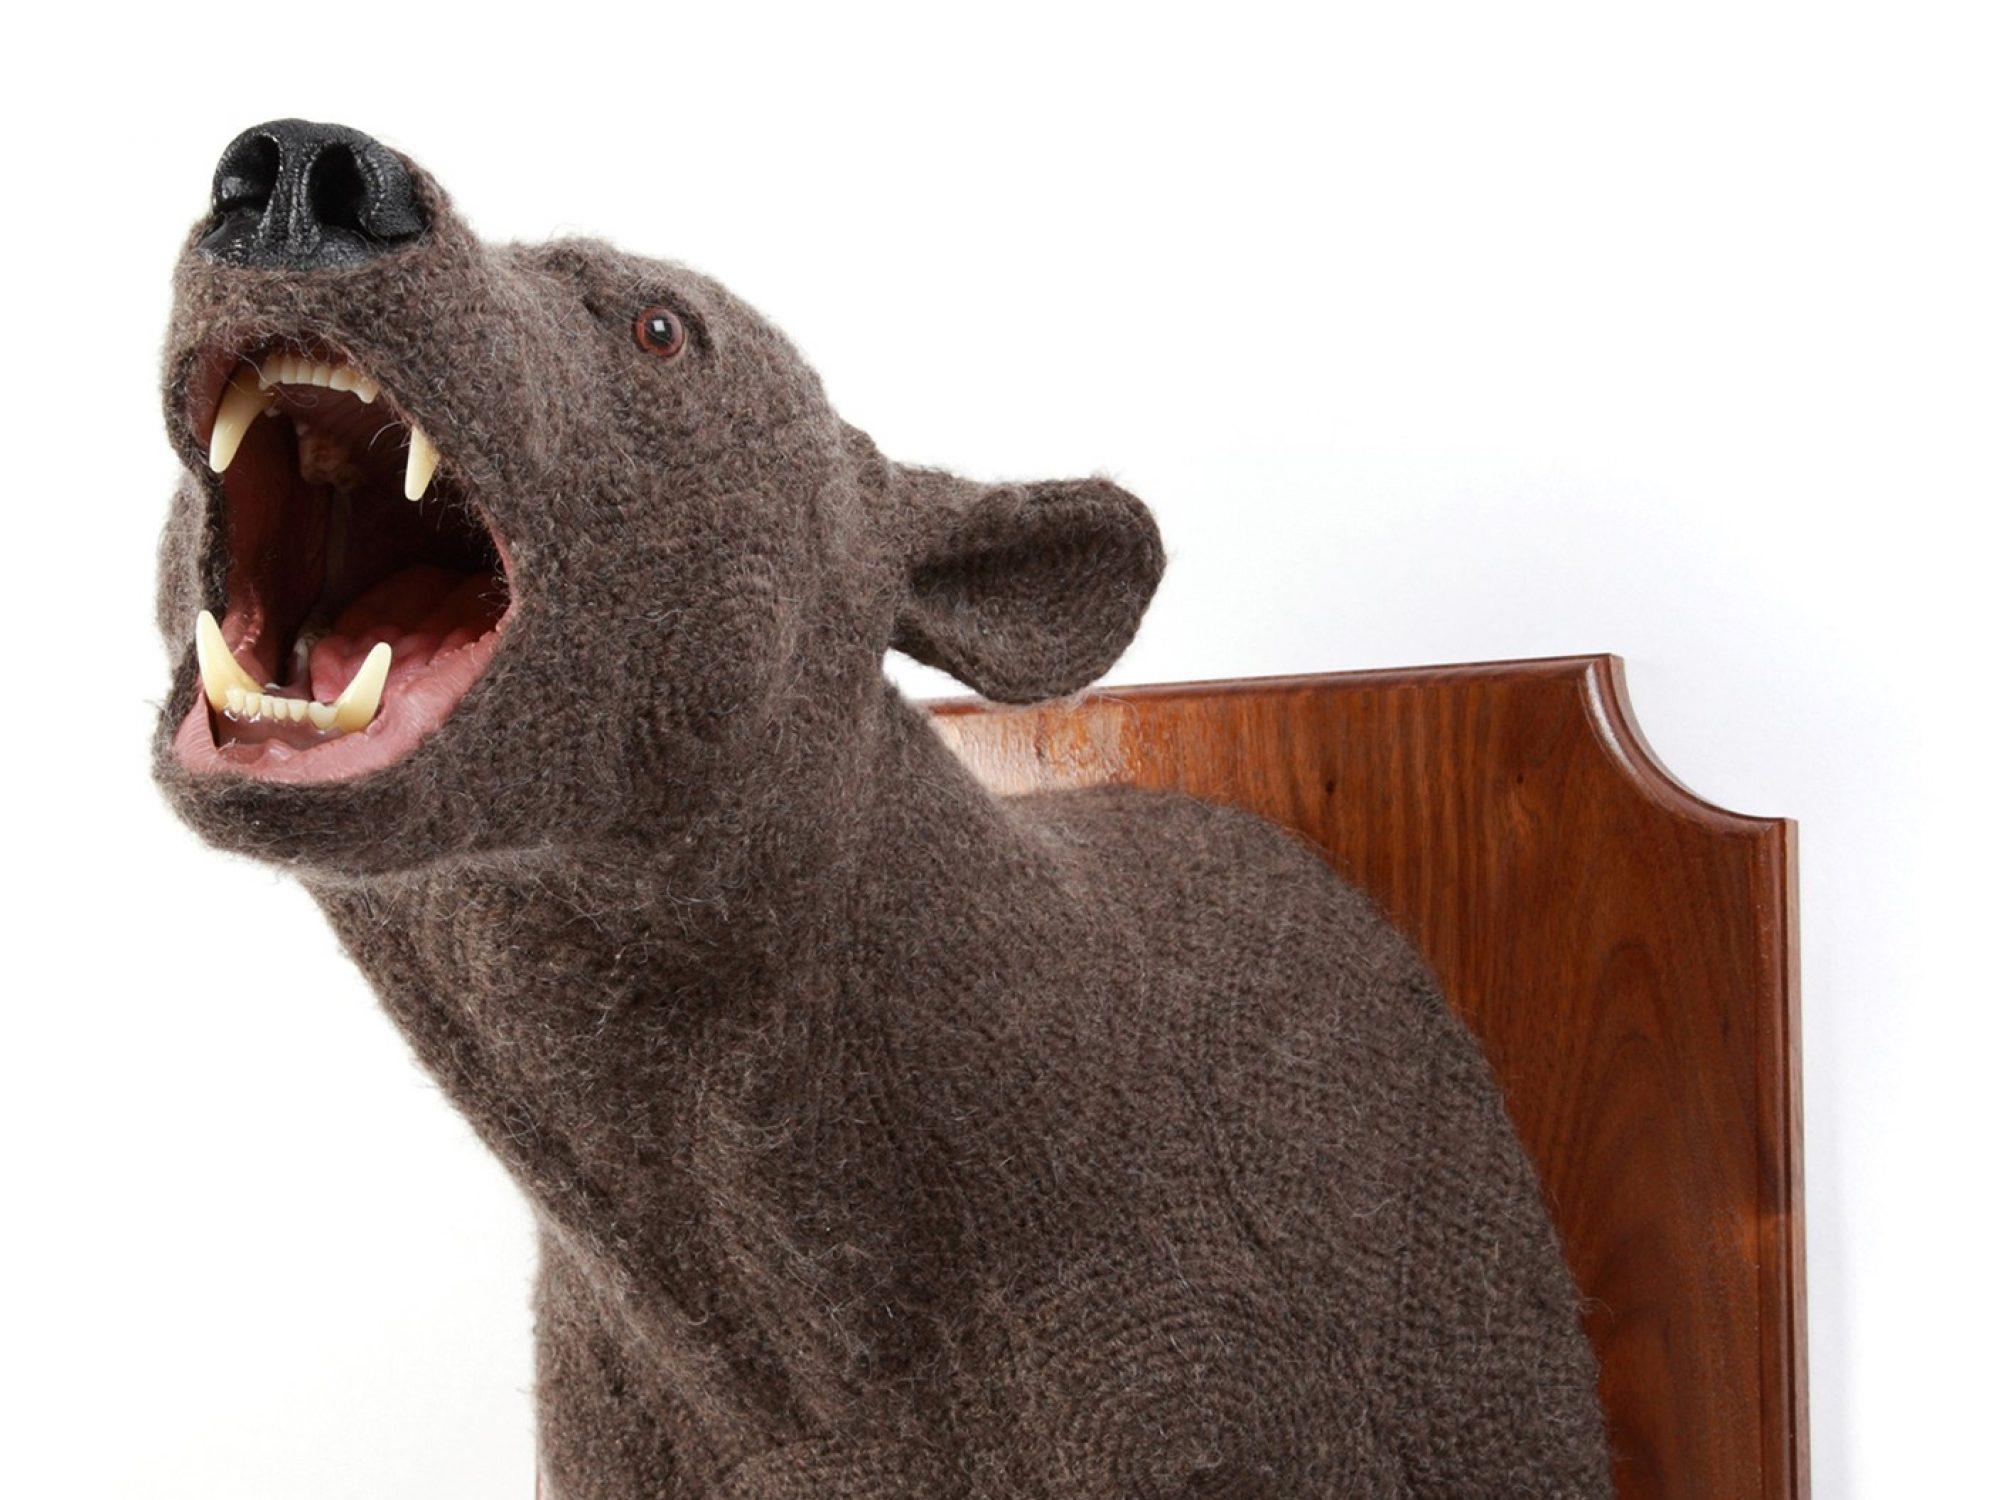 Crotchet sculpture of bear